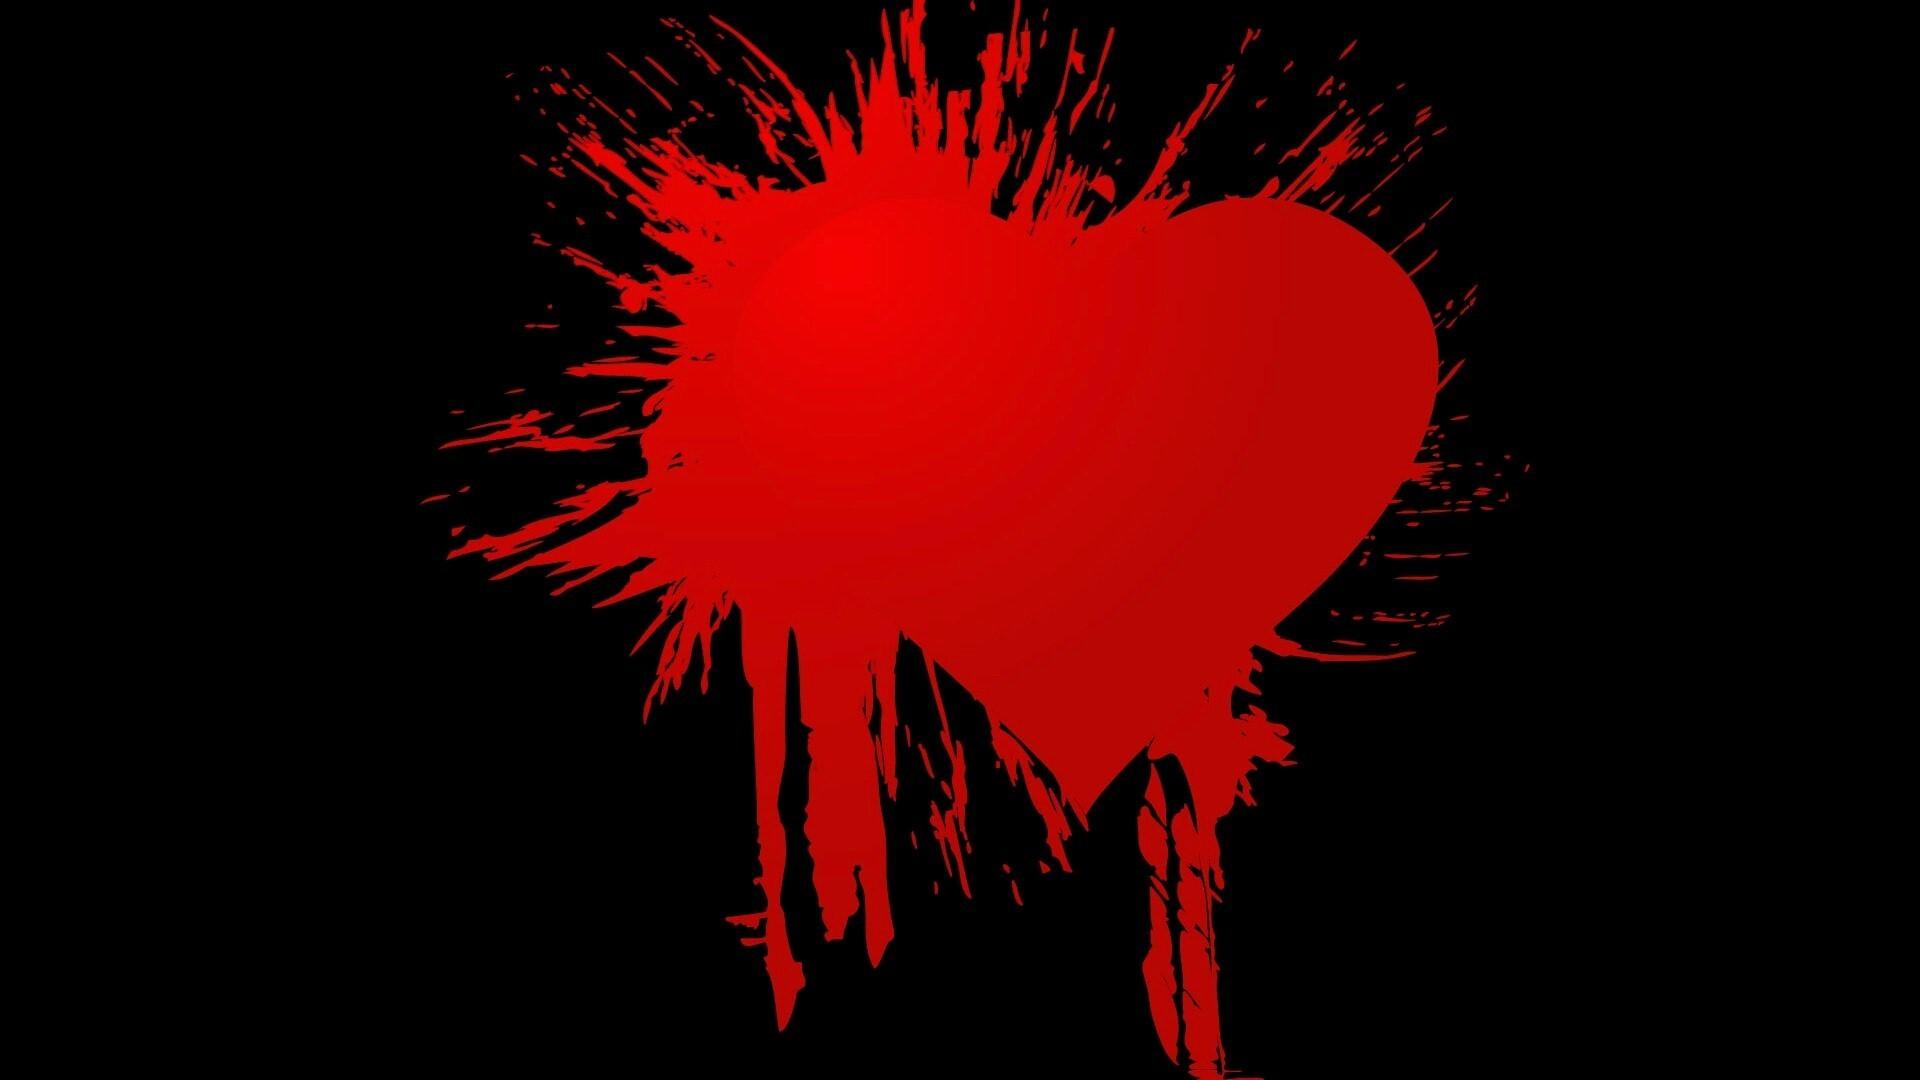 Bloody Heart | HD Wallpapers